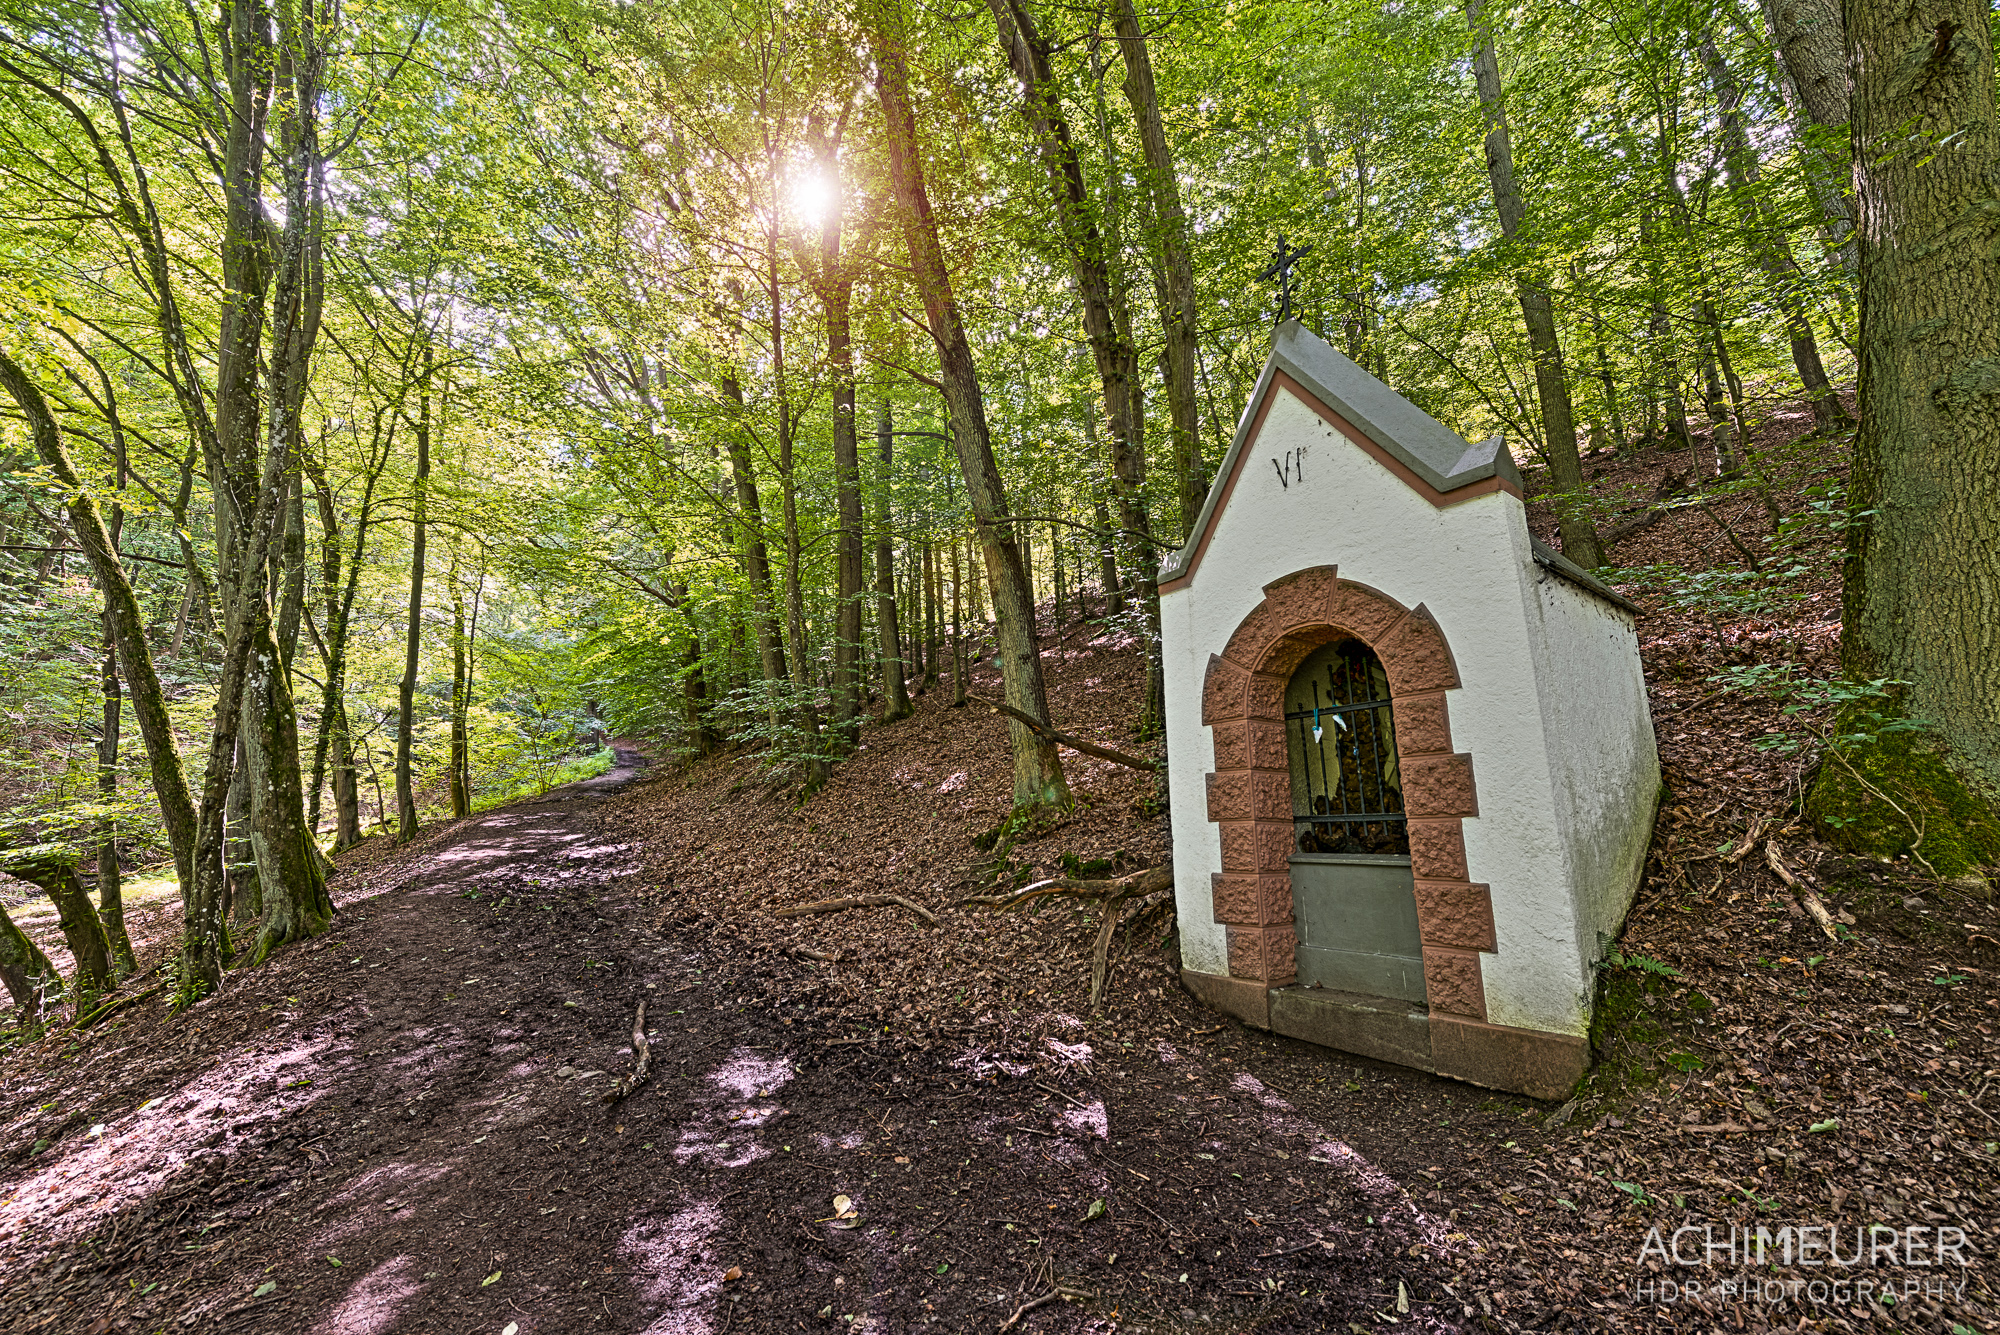 Eifel-Rheinland-Pfalz-Rureifel_5421_20_19_18_17_16_15_HDR-Bearbeitet